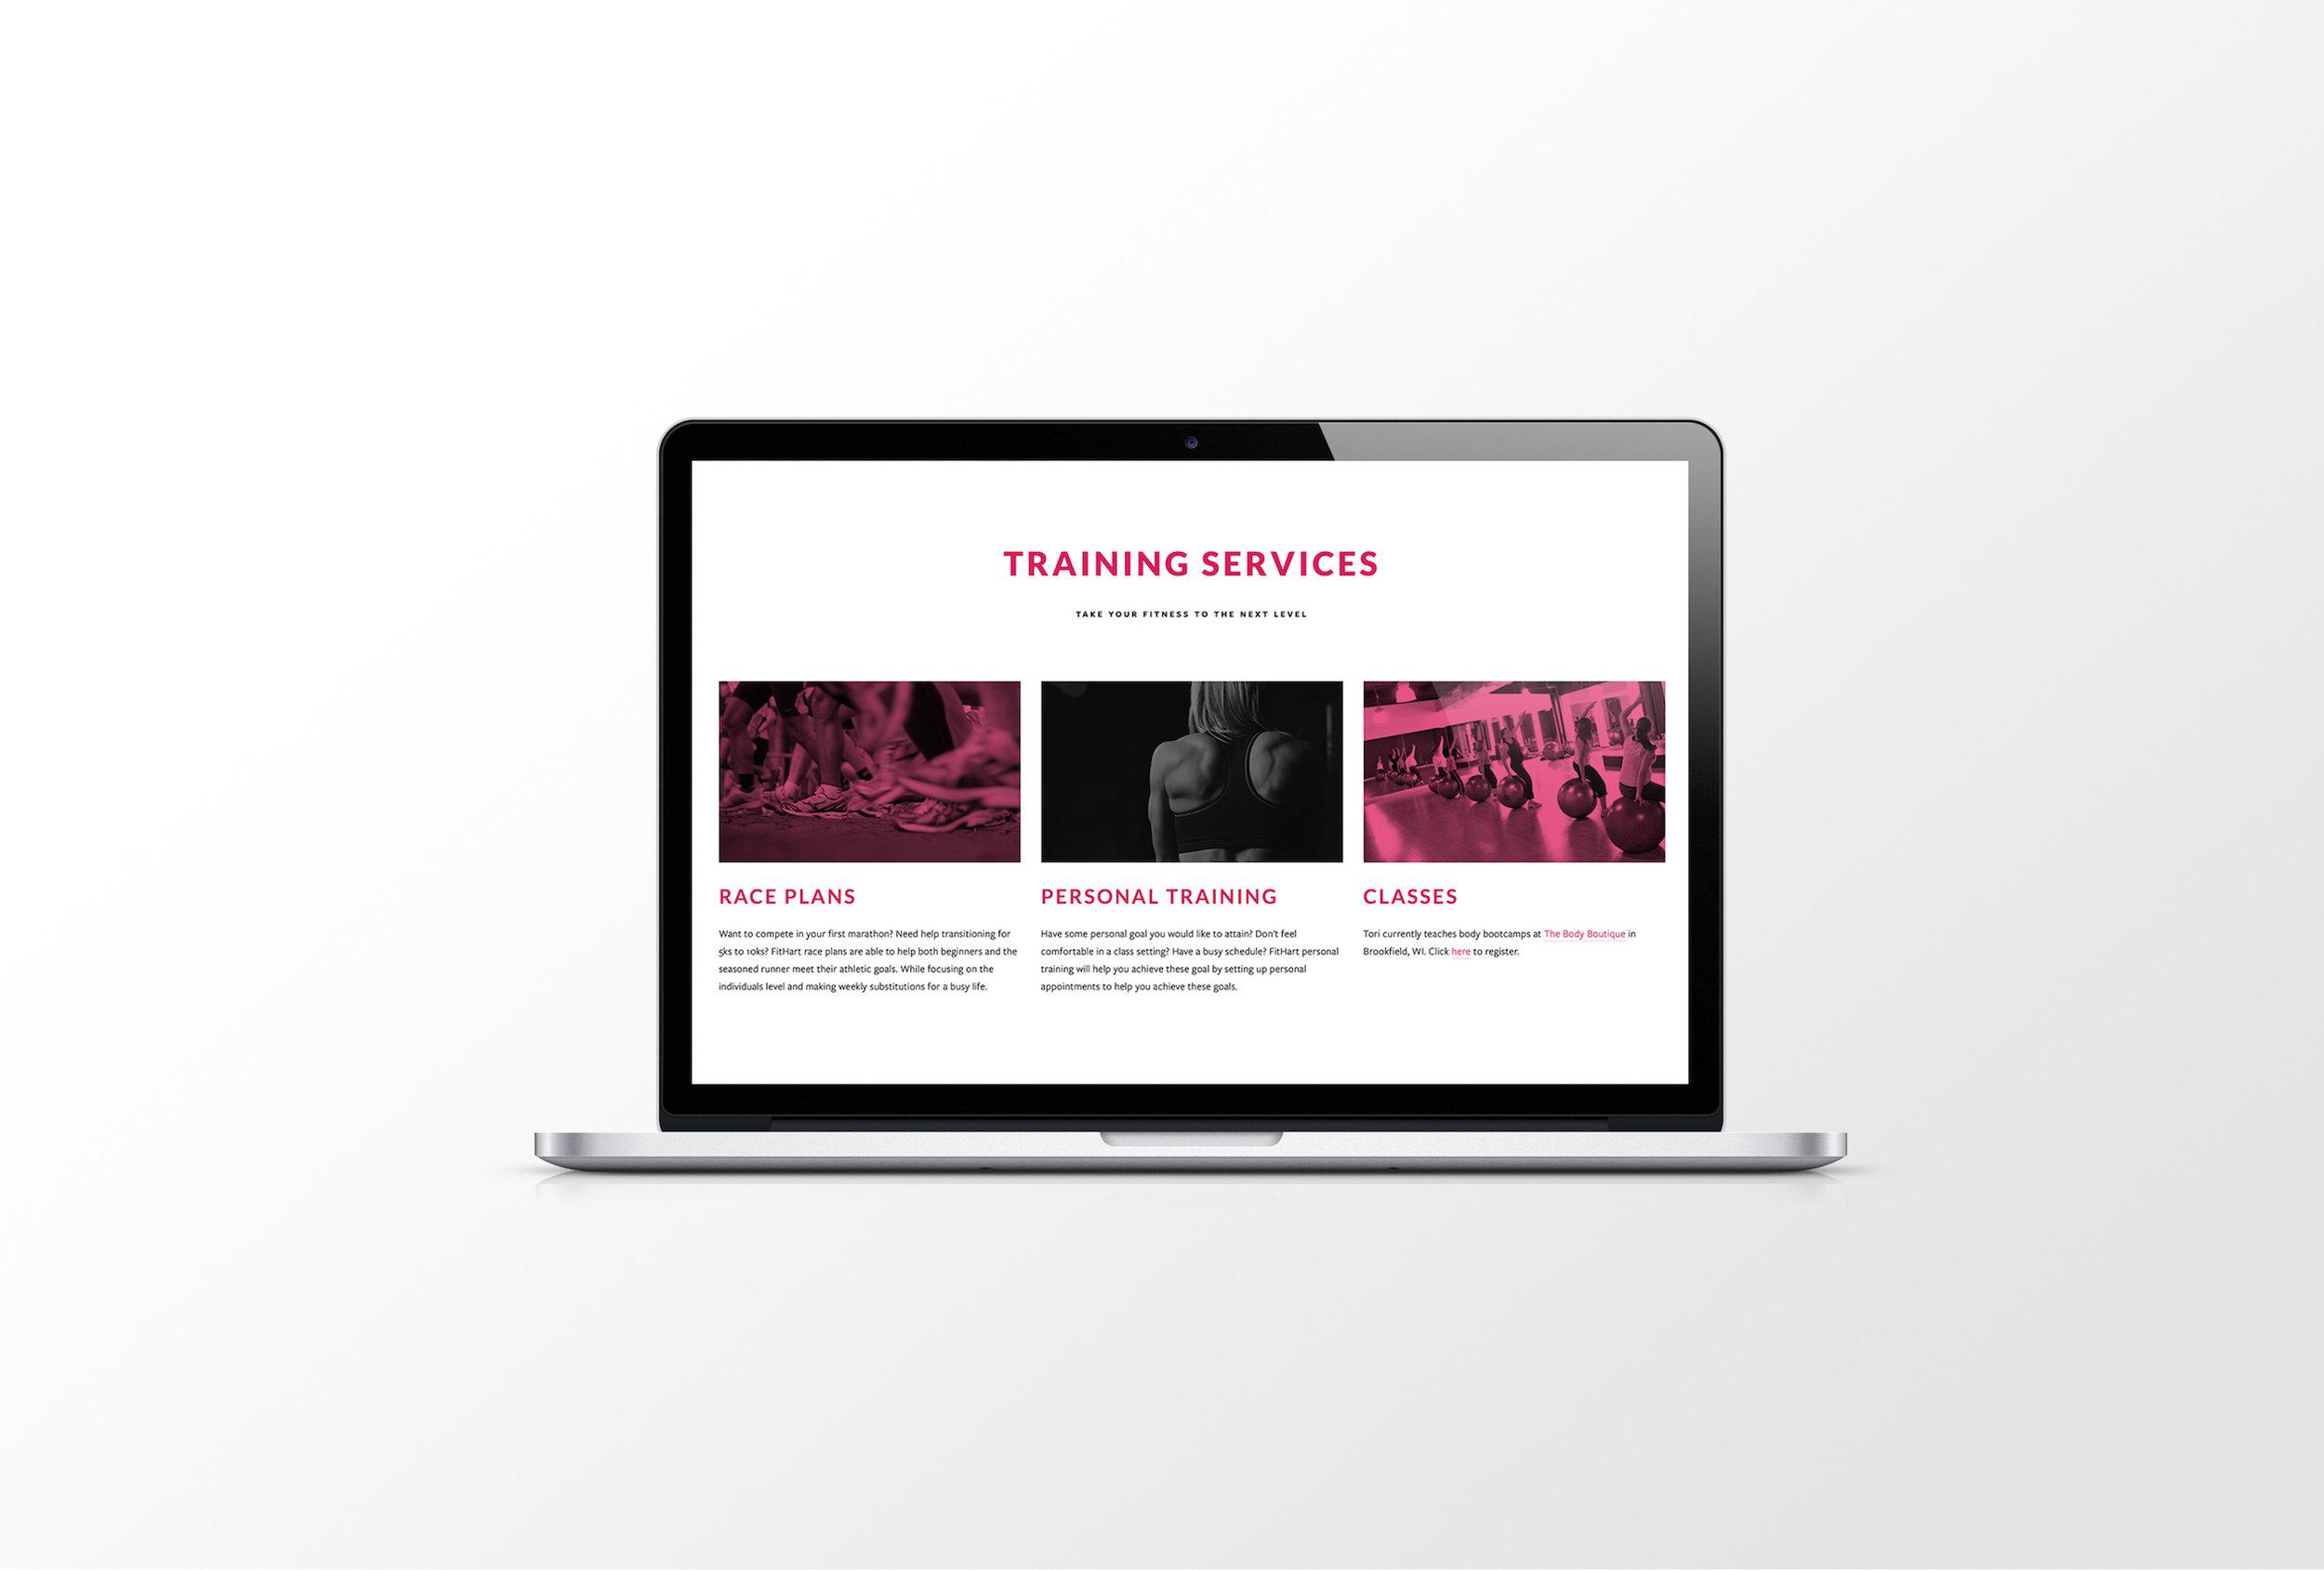 Golden-Antler-Graphic-Design-Milwaukee-Web-Branding-Marketing-Wisconsin-FitHart-Fitness-Website-Squarespace-Blog-Development-Services